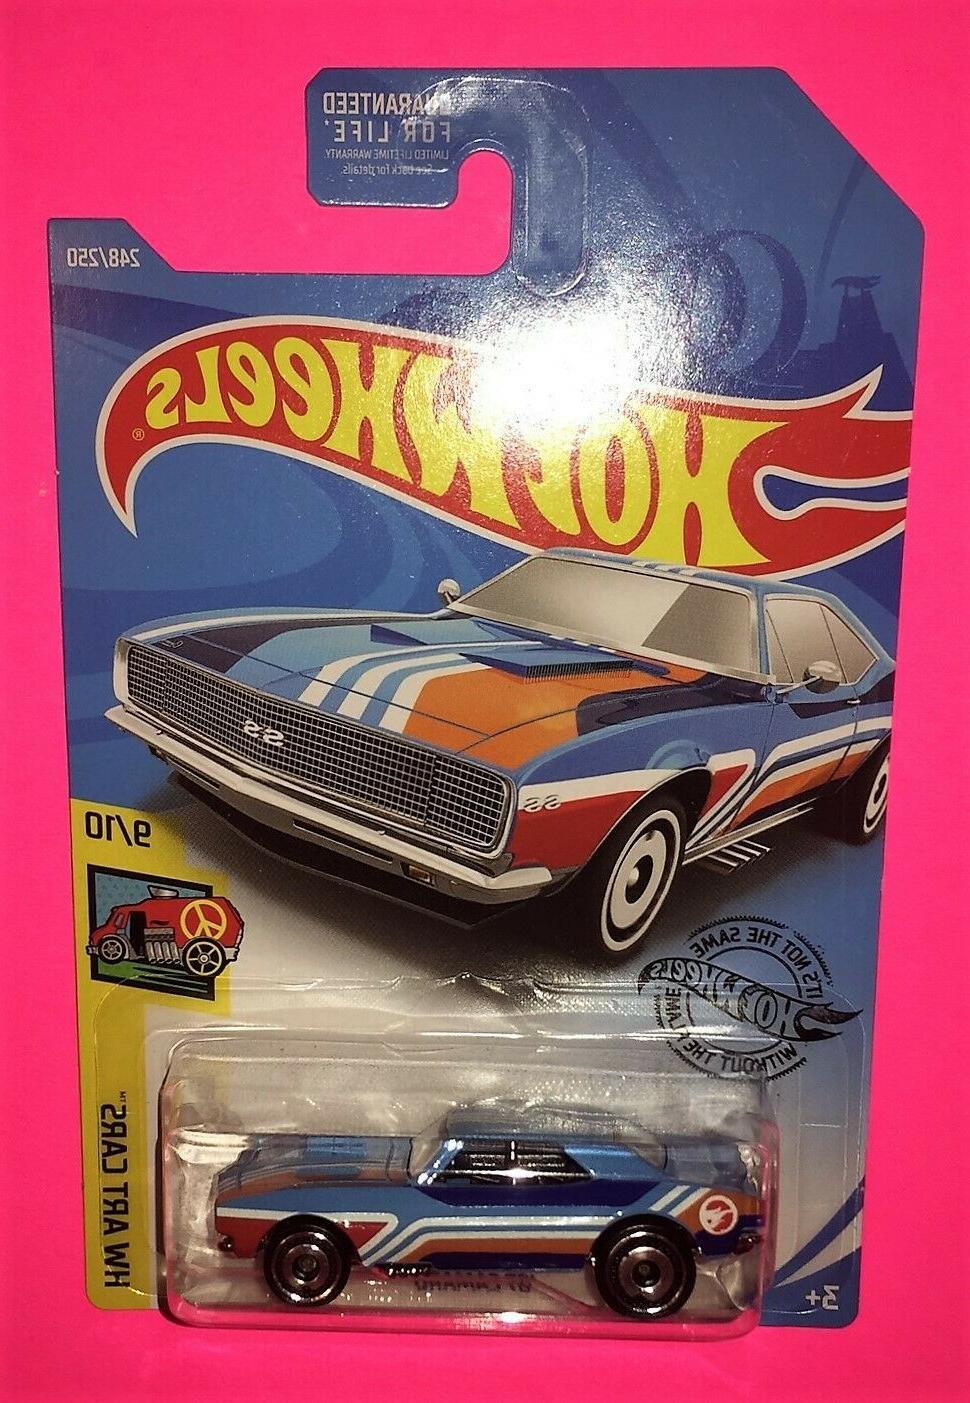 248 250 hw art cars 9 10